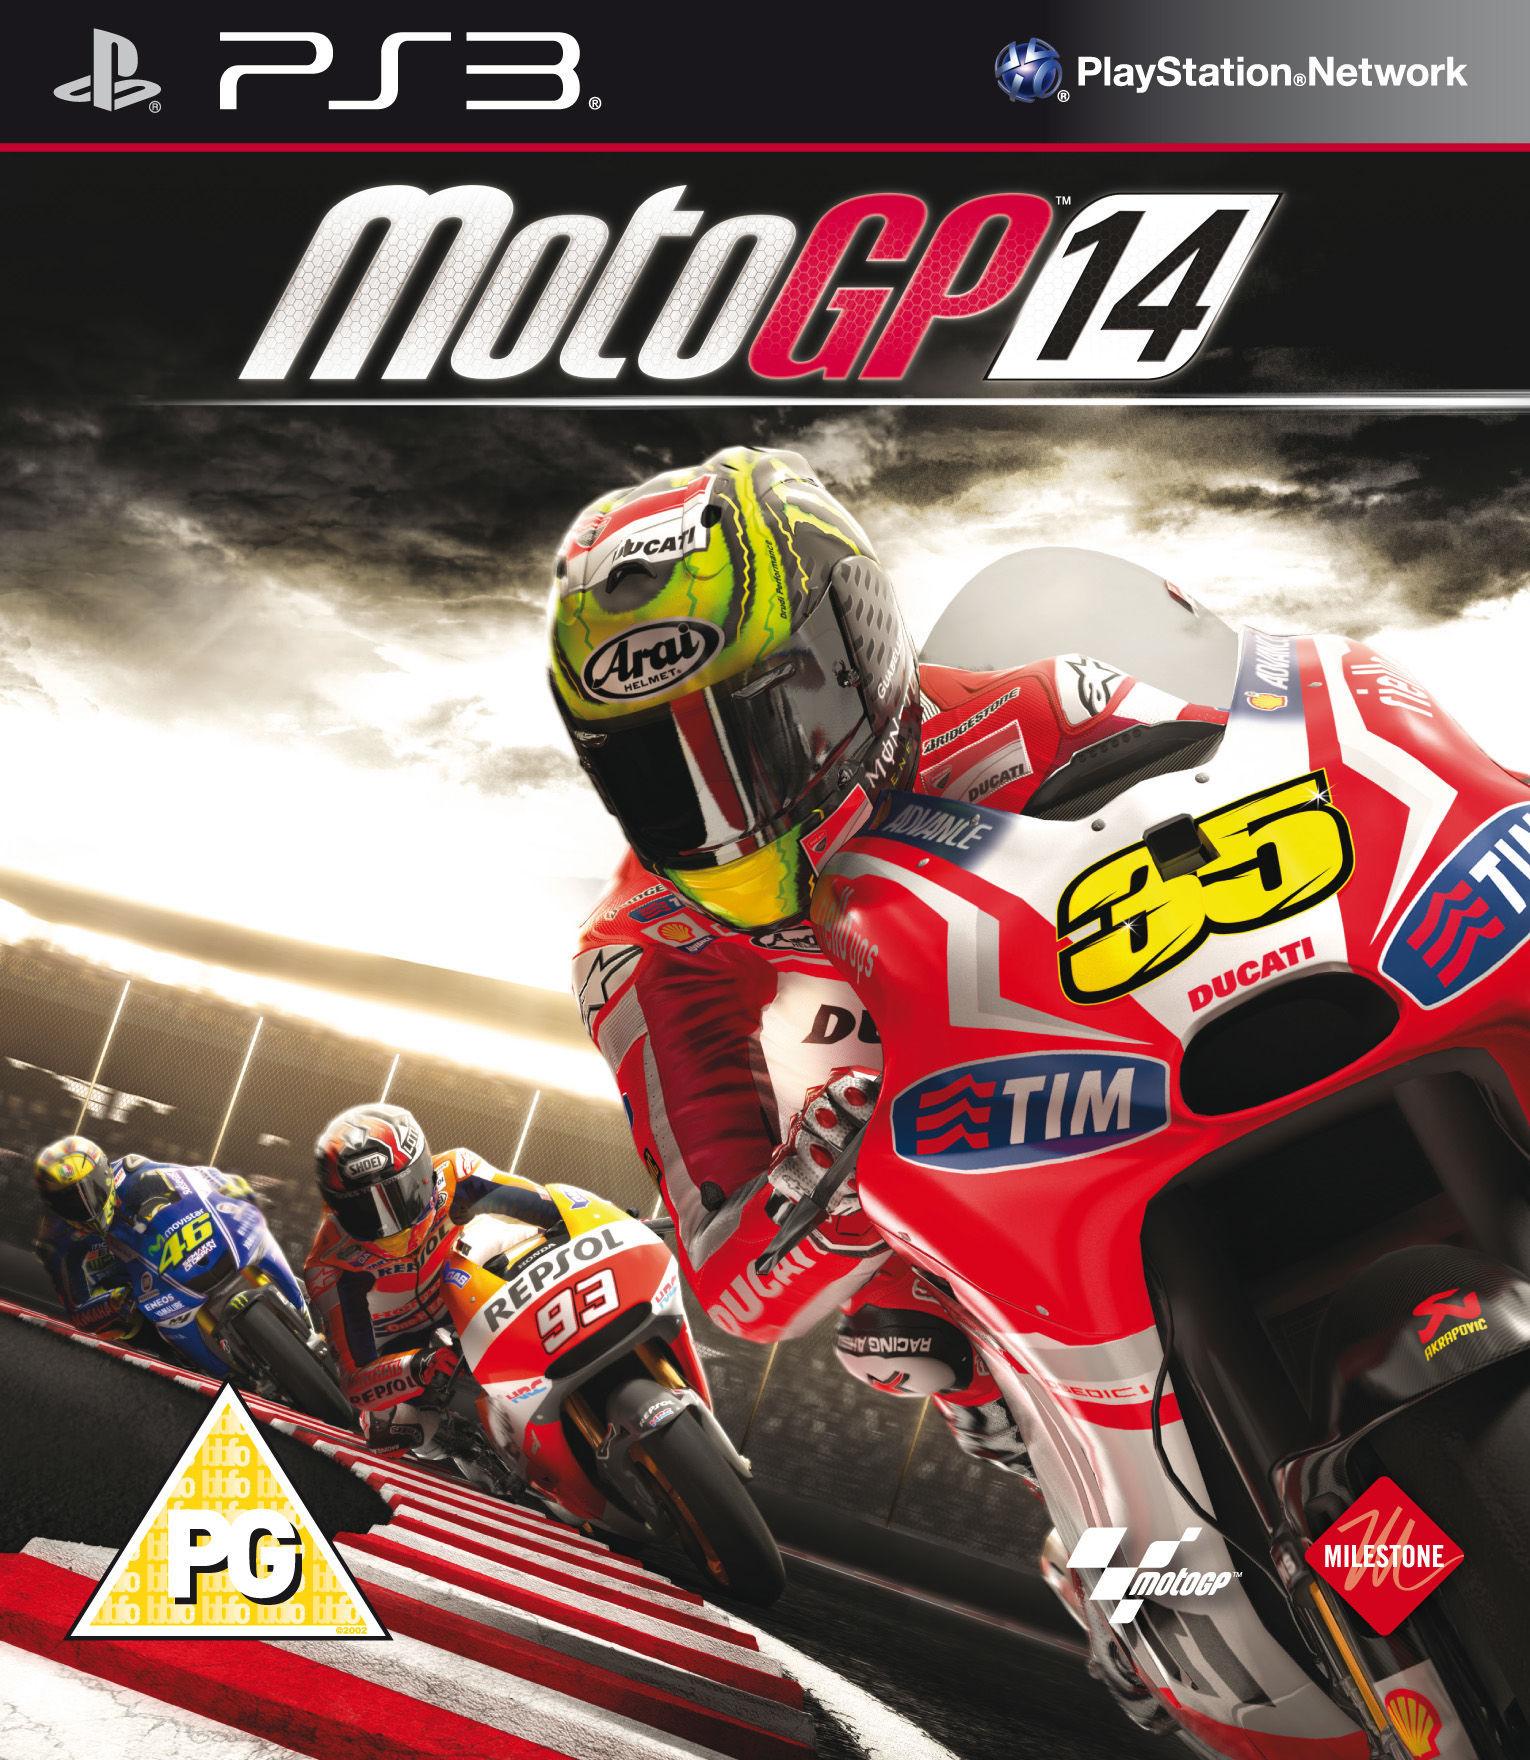 MOTO GP 2014 PS3 SEMINUEVO